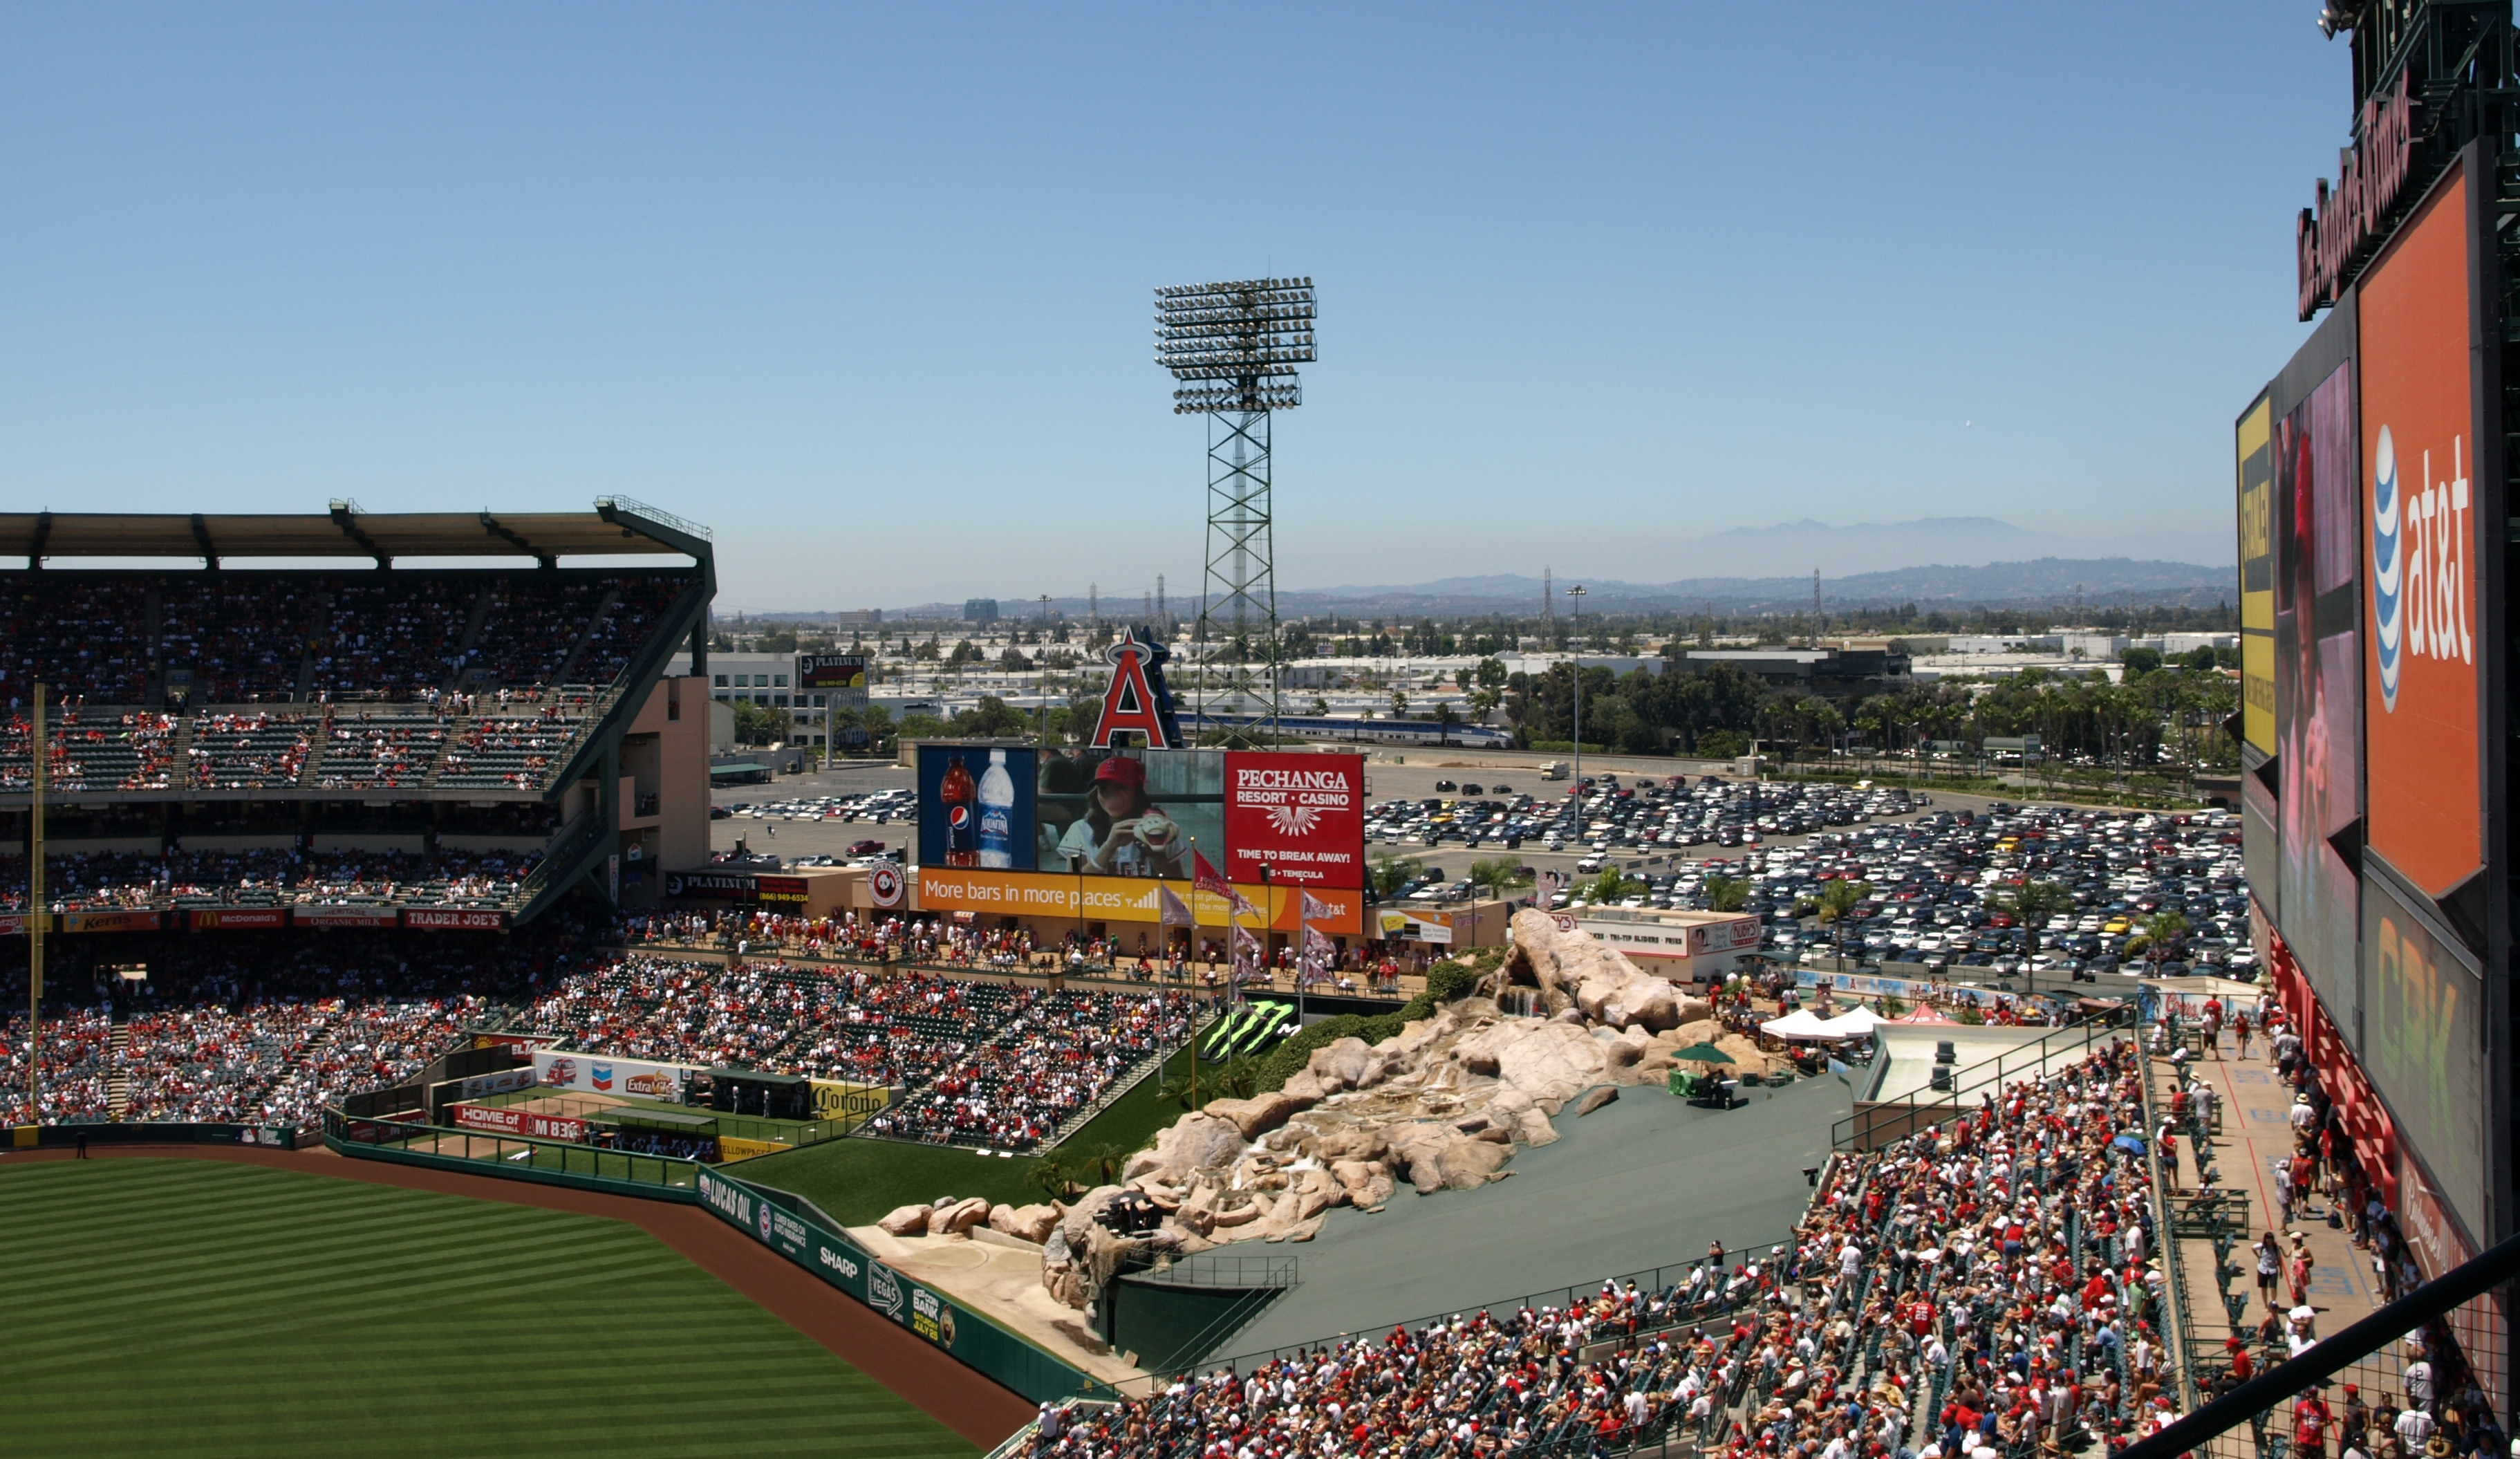 File:Anaheim Stadium July 12, 2009